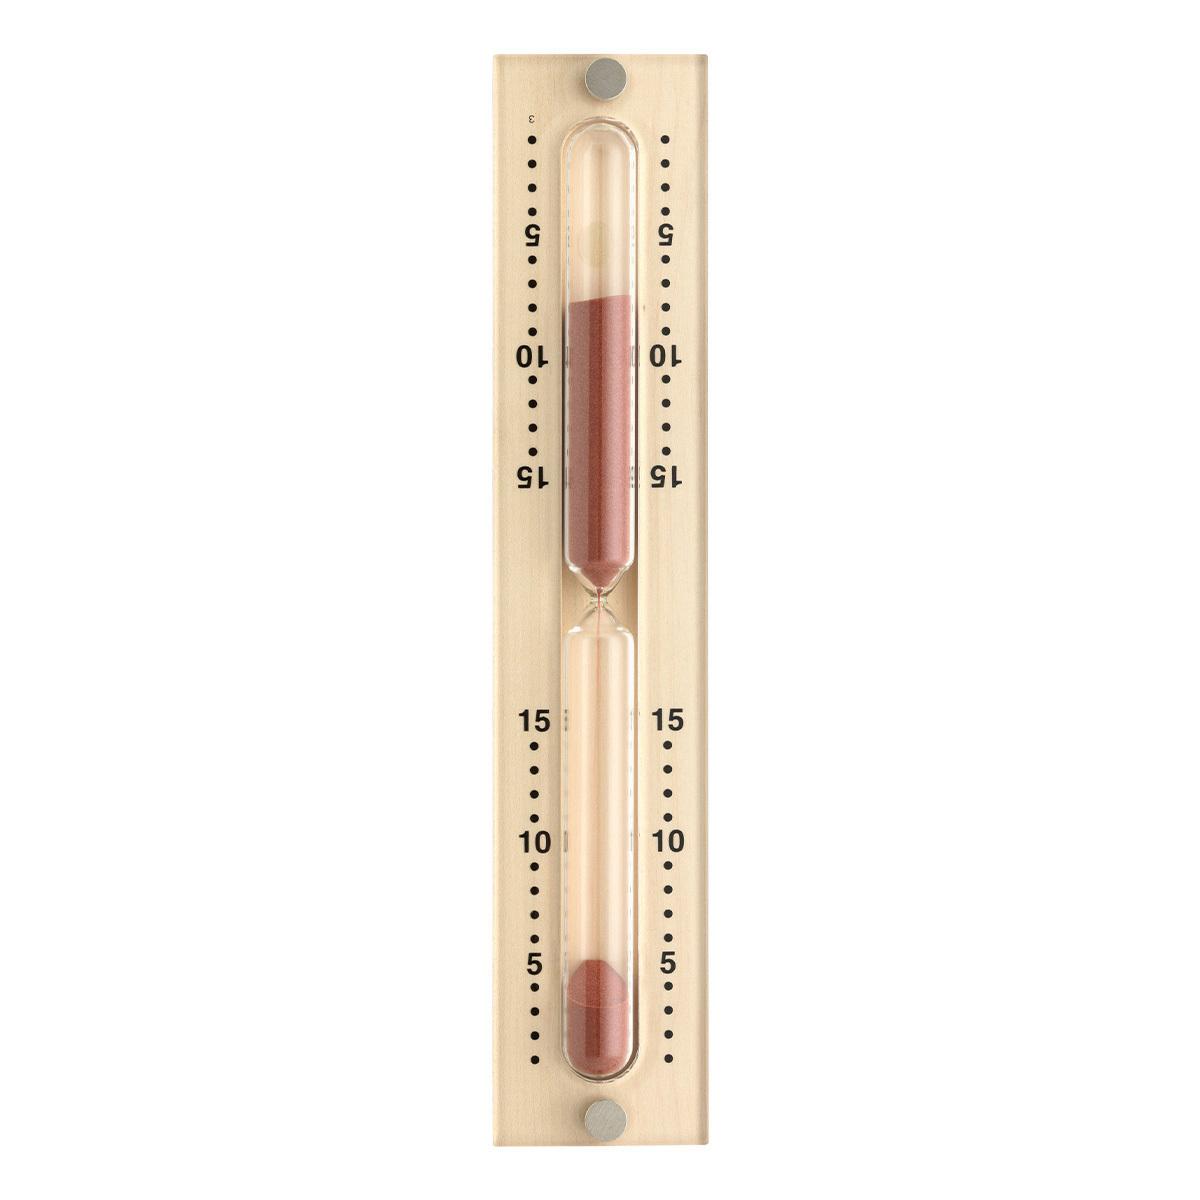 40-1045-15-sauna-sanduhr-massivholz-1200x1200px.jpg